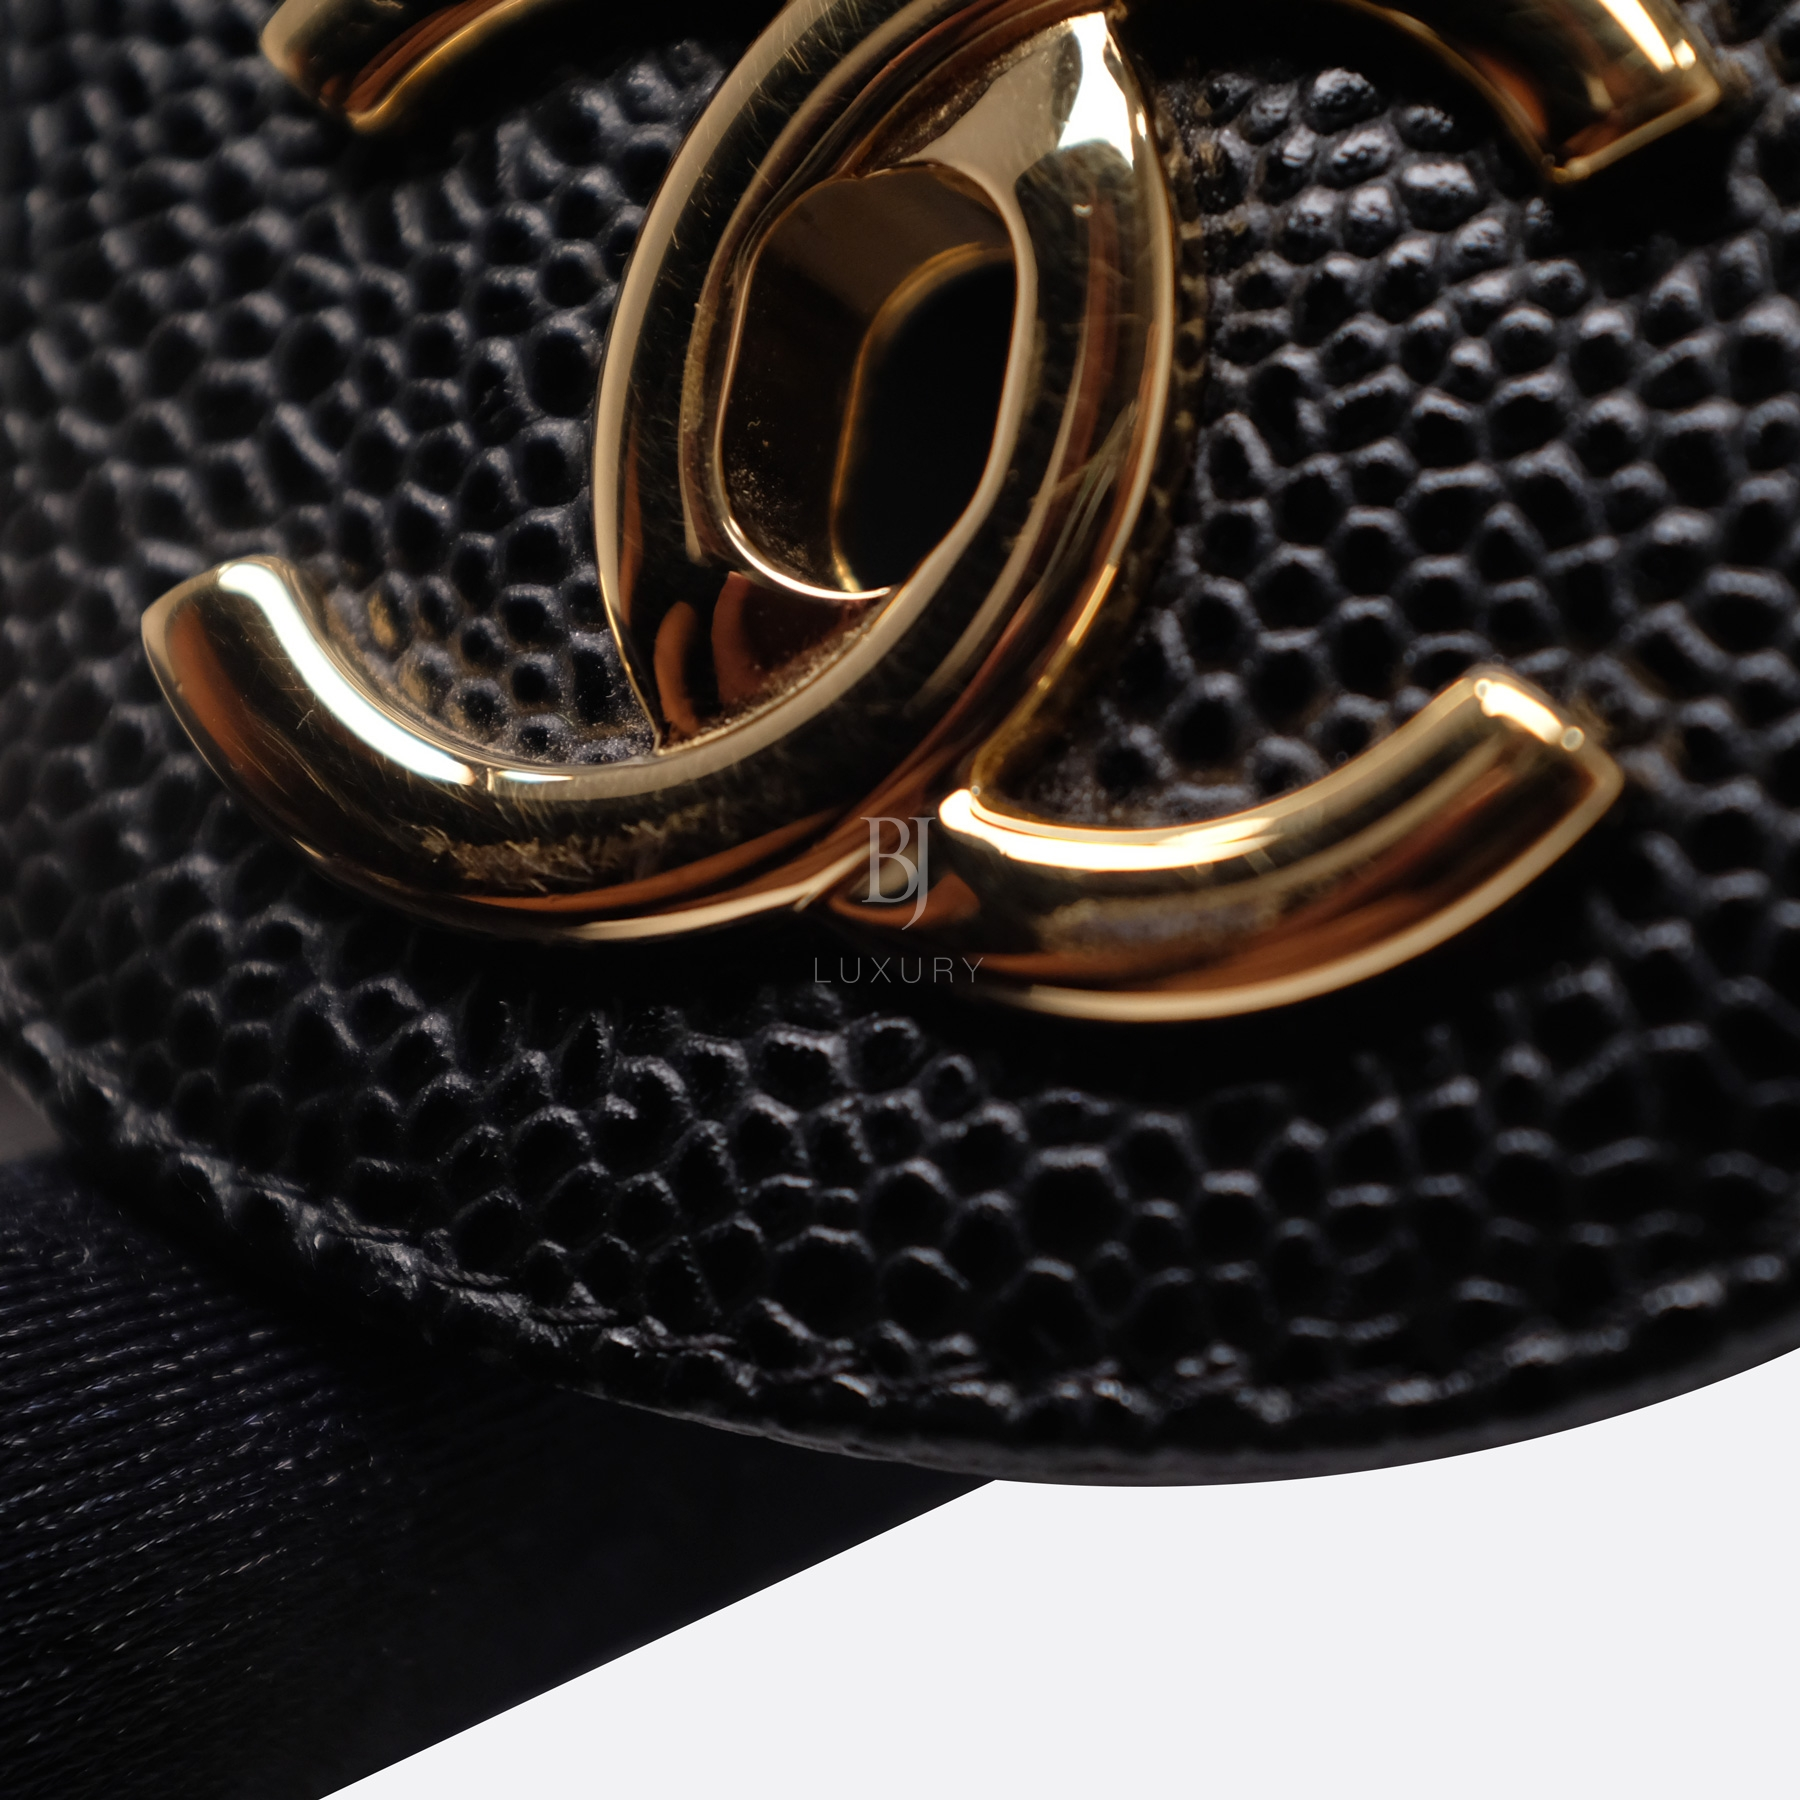 Chanel Classic Handbag Caviar Maxi Black BJ Luxury 14.jpg